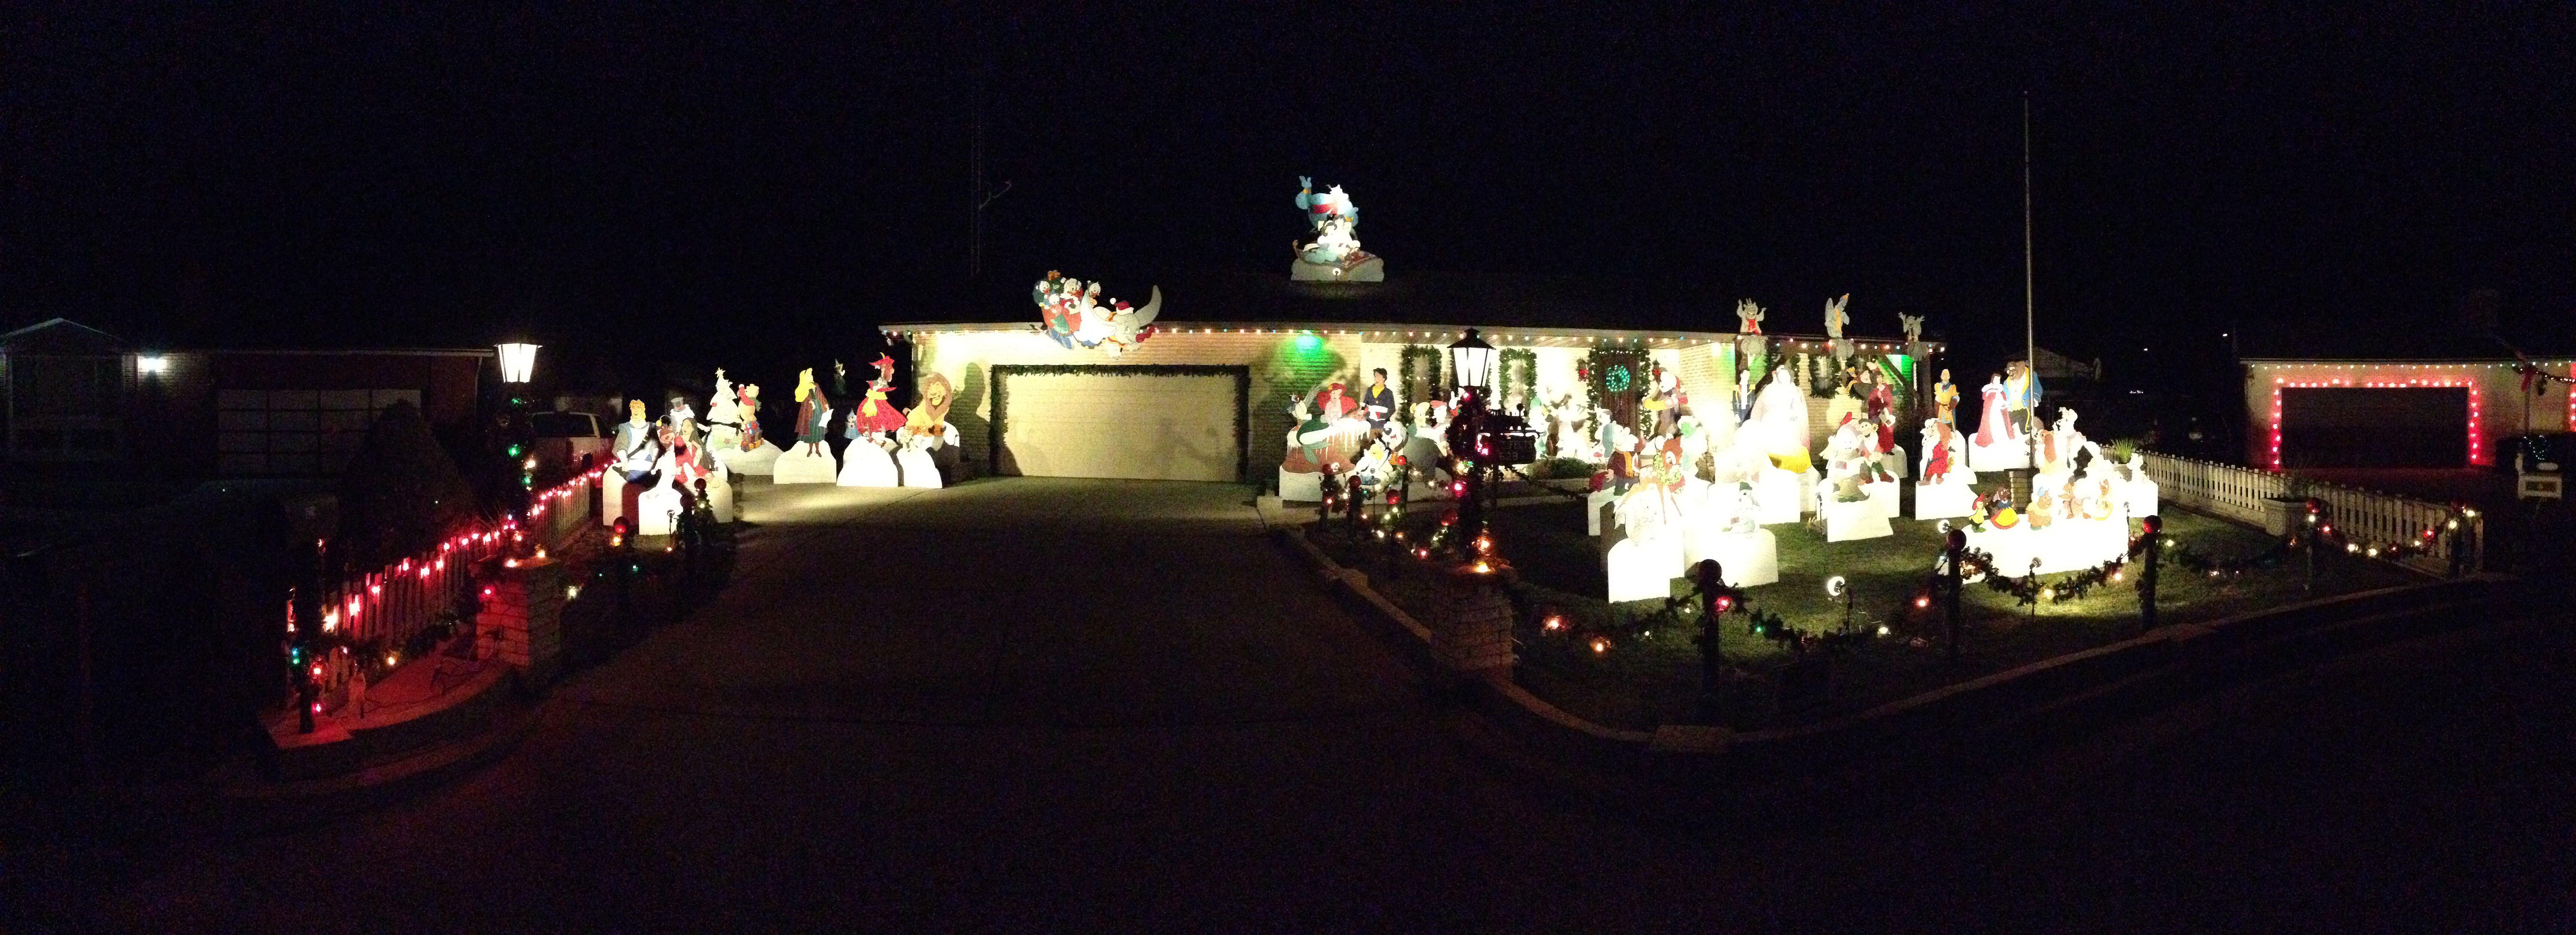 Disney Christmas Display In Brigham City, Ut